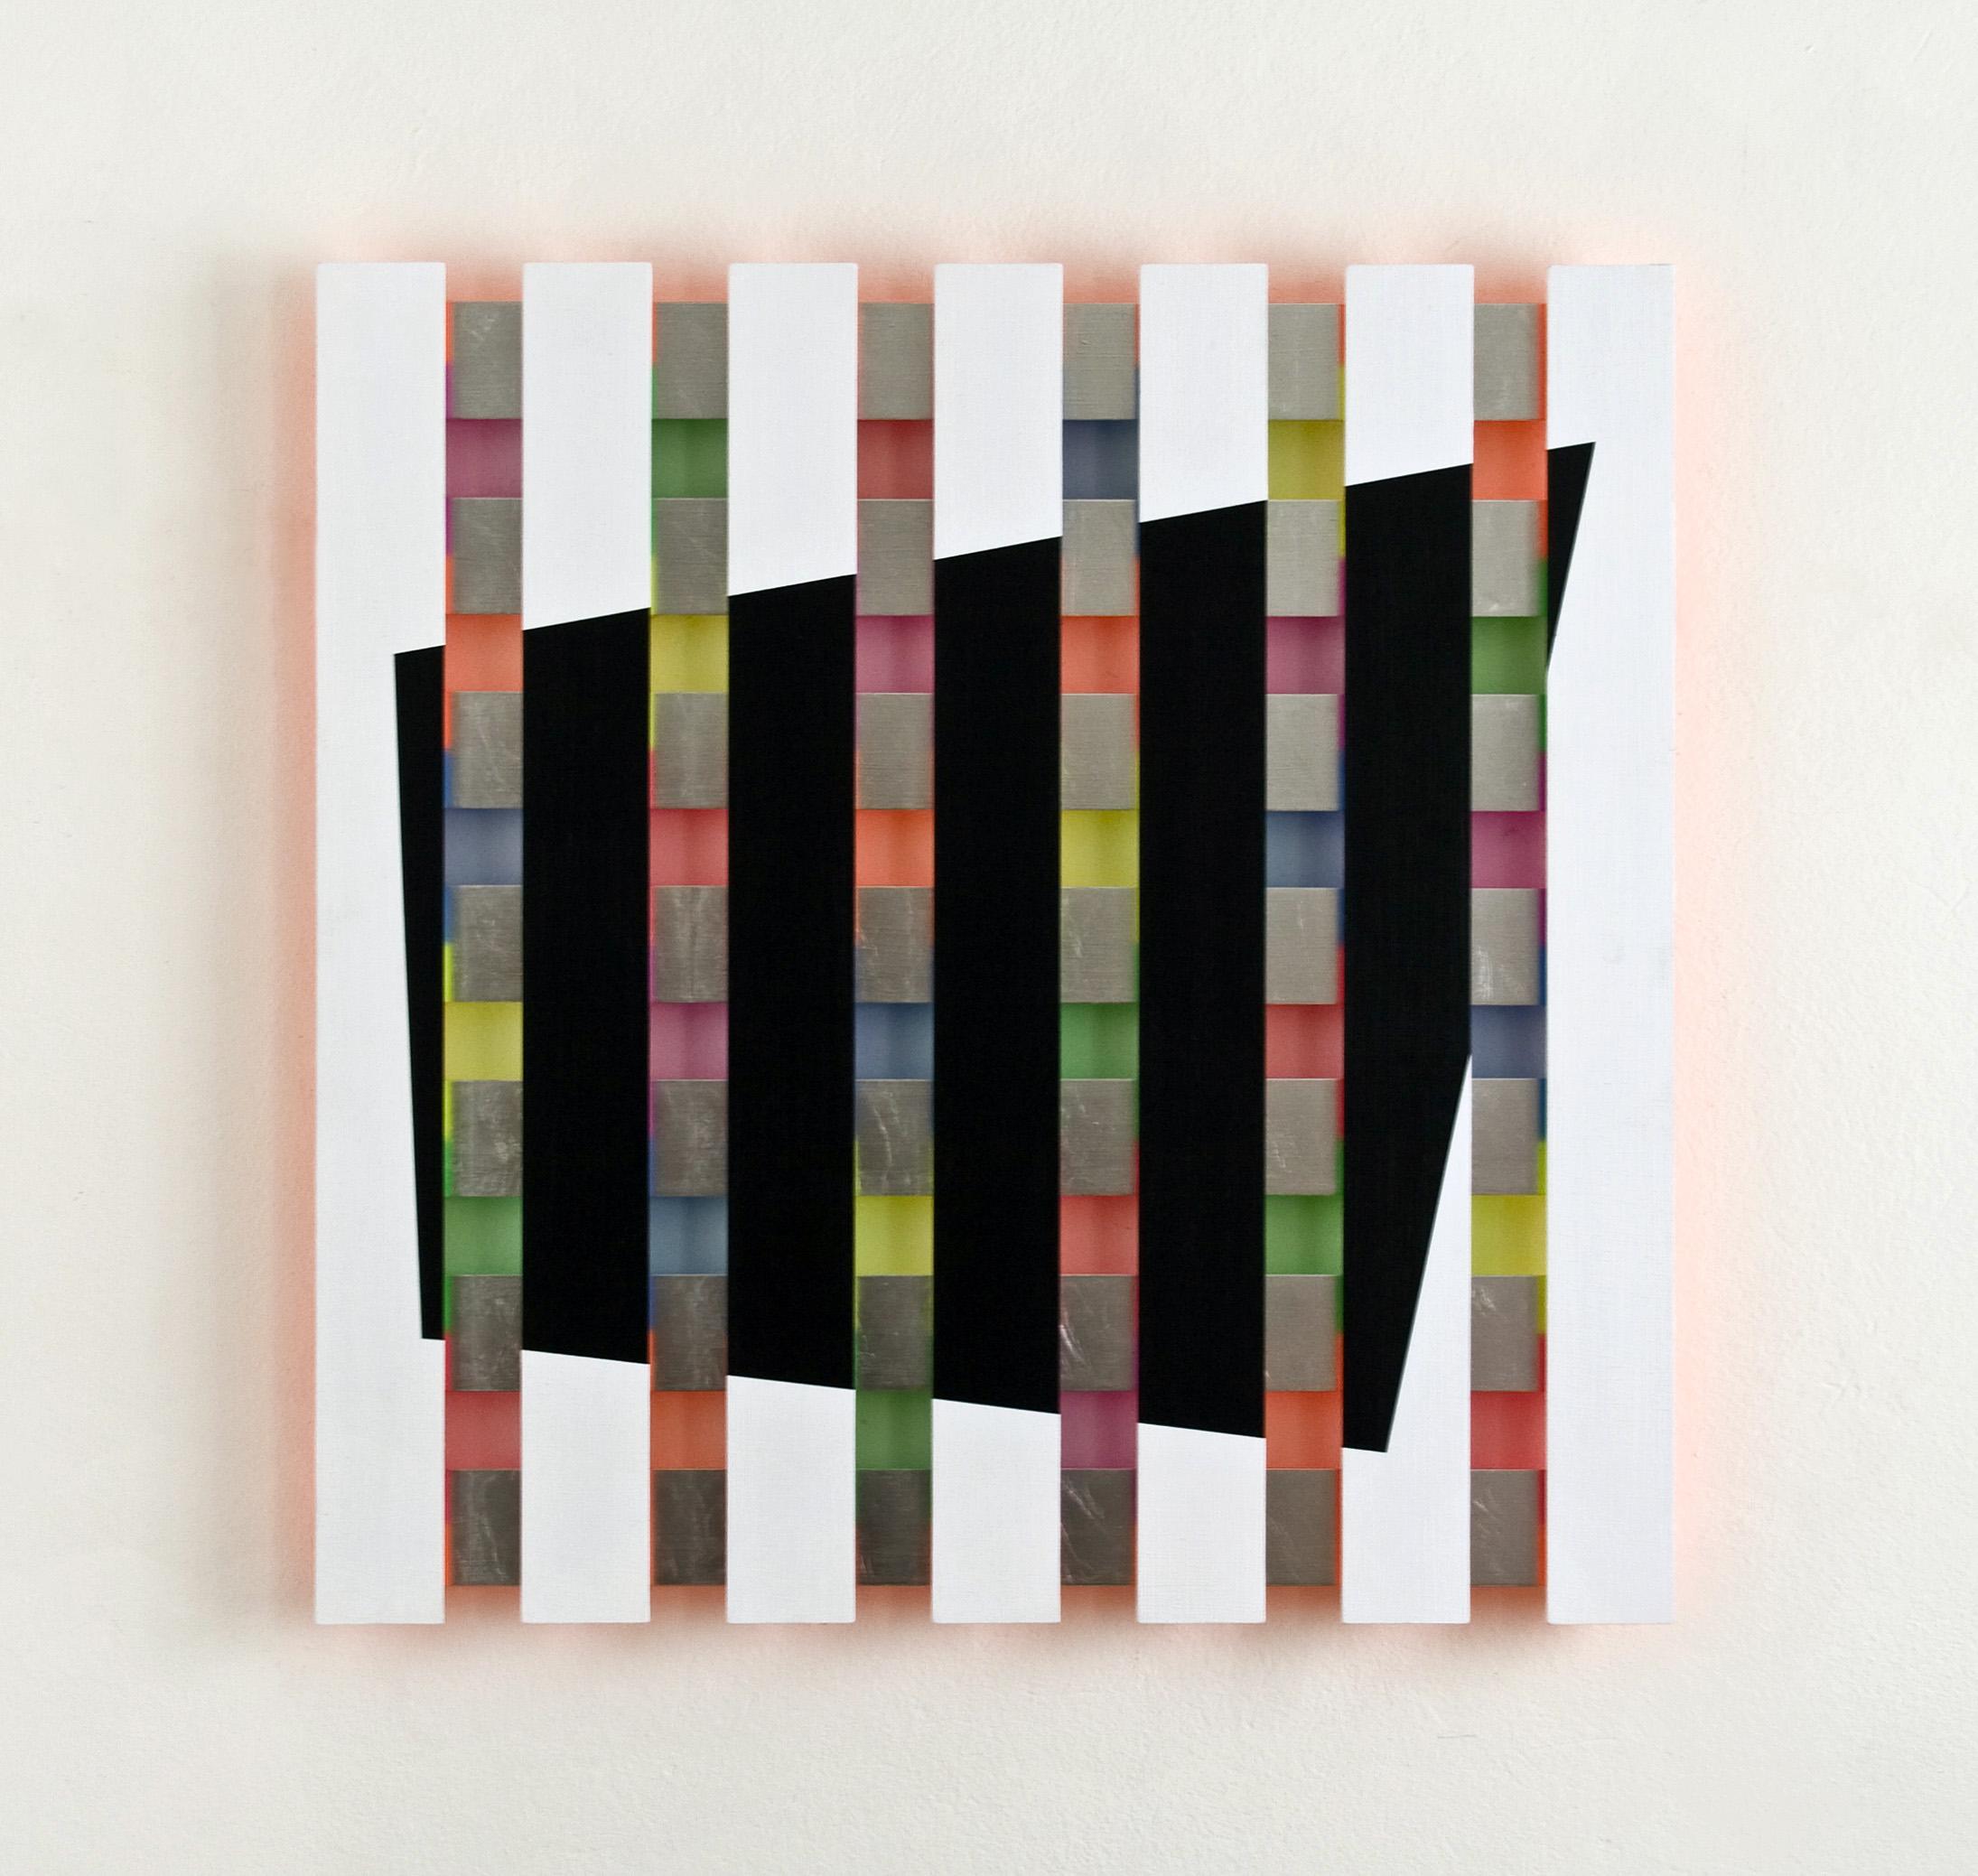 les, akril, 2012